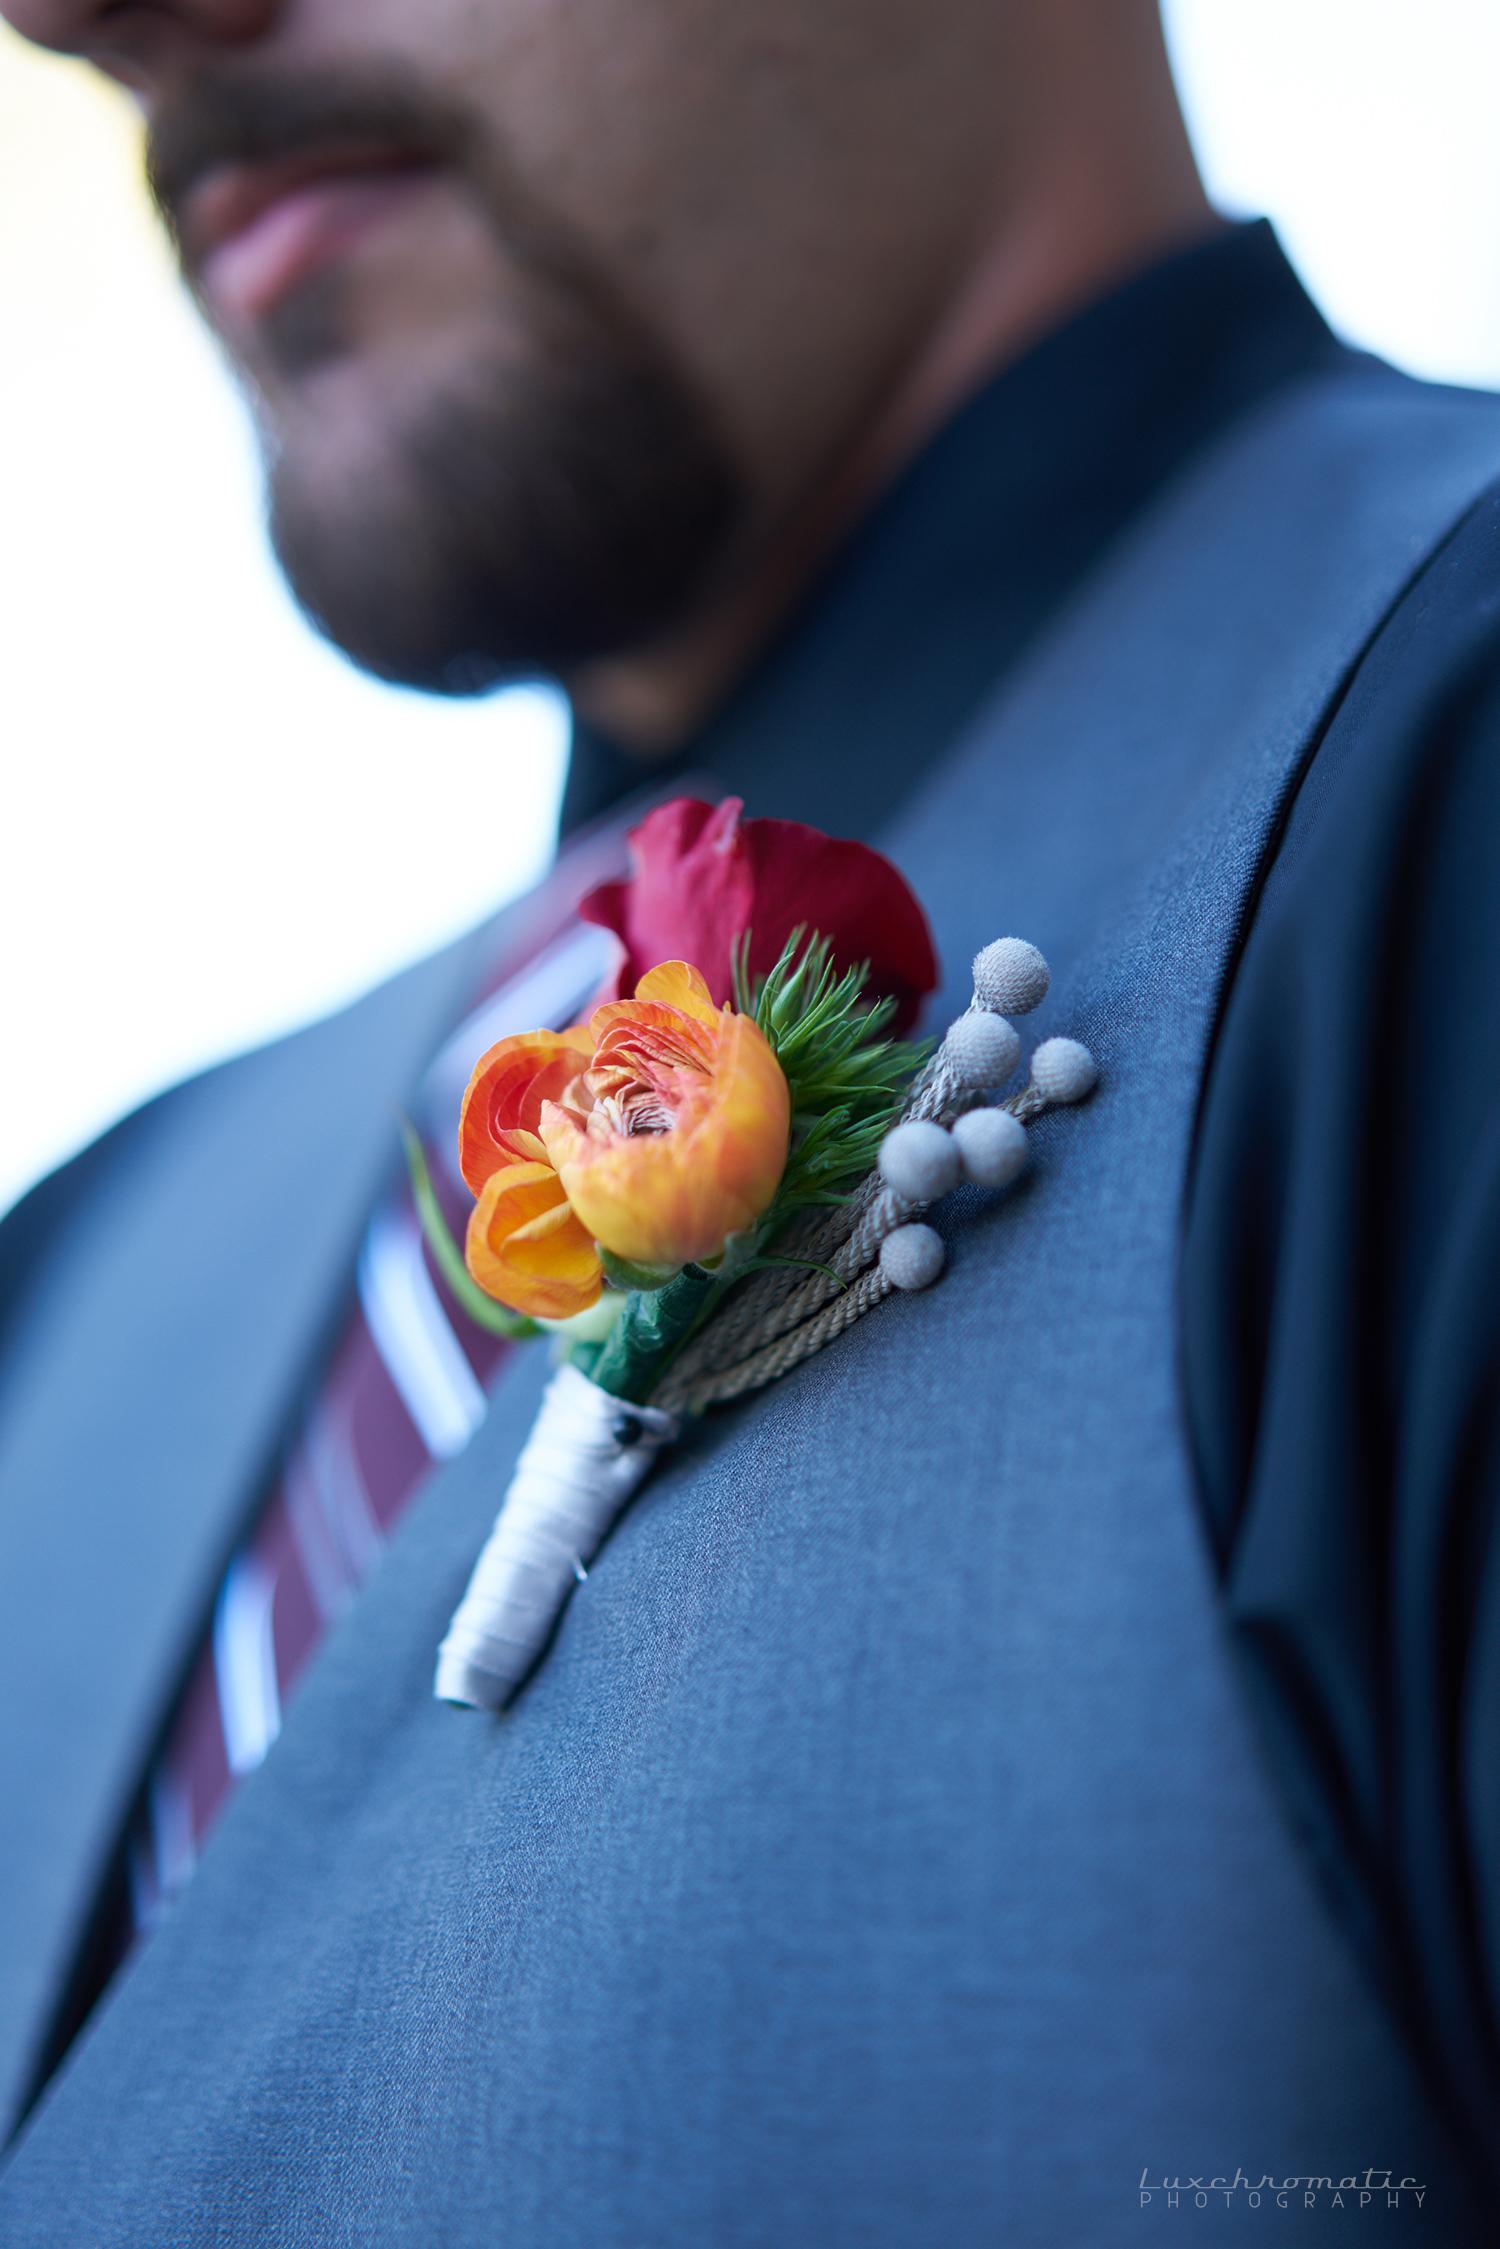 081217_Rachel_Chris_a0272-weddingdress-bride-weddingphotography-weddingphotographer-bridal-groom-wedding-engagementring-proposal-brides-diamondring-sonyalpha-sony-sonya9-sonya7rii-sanfrancisco-sf-bayarea-photographer-profoto-murrietas-well.jpg